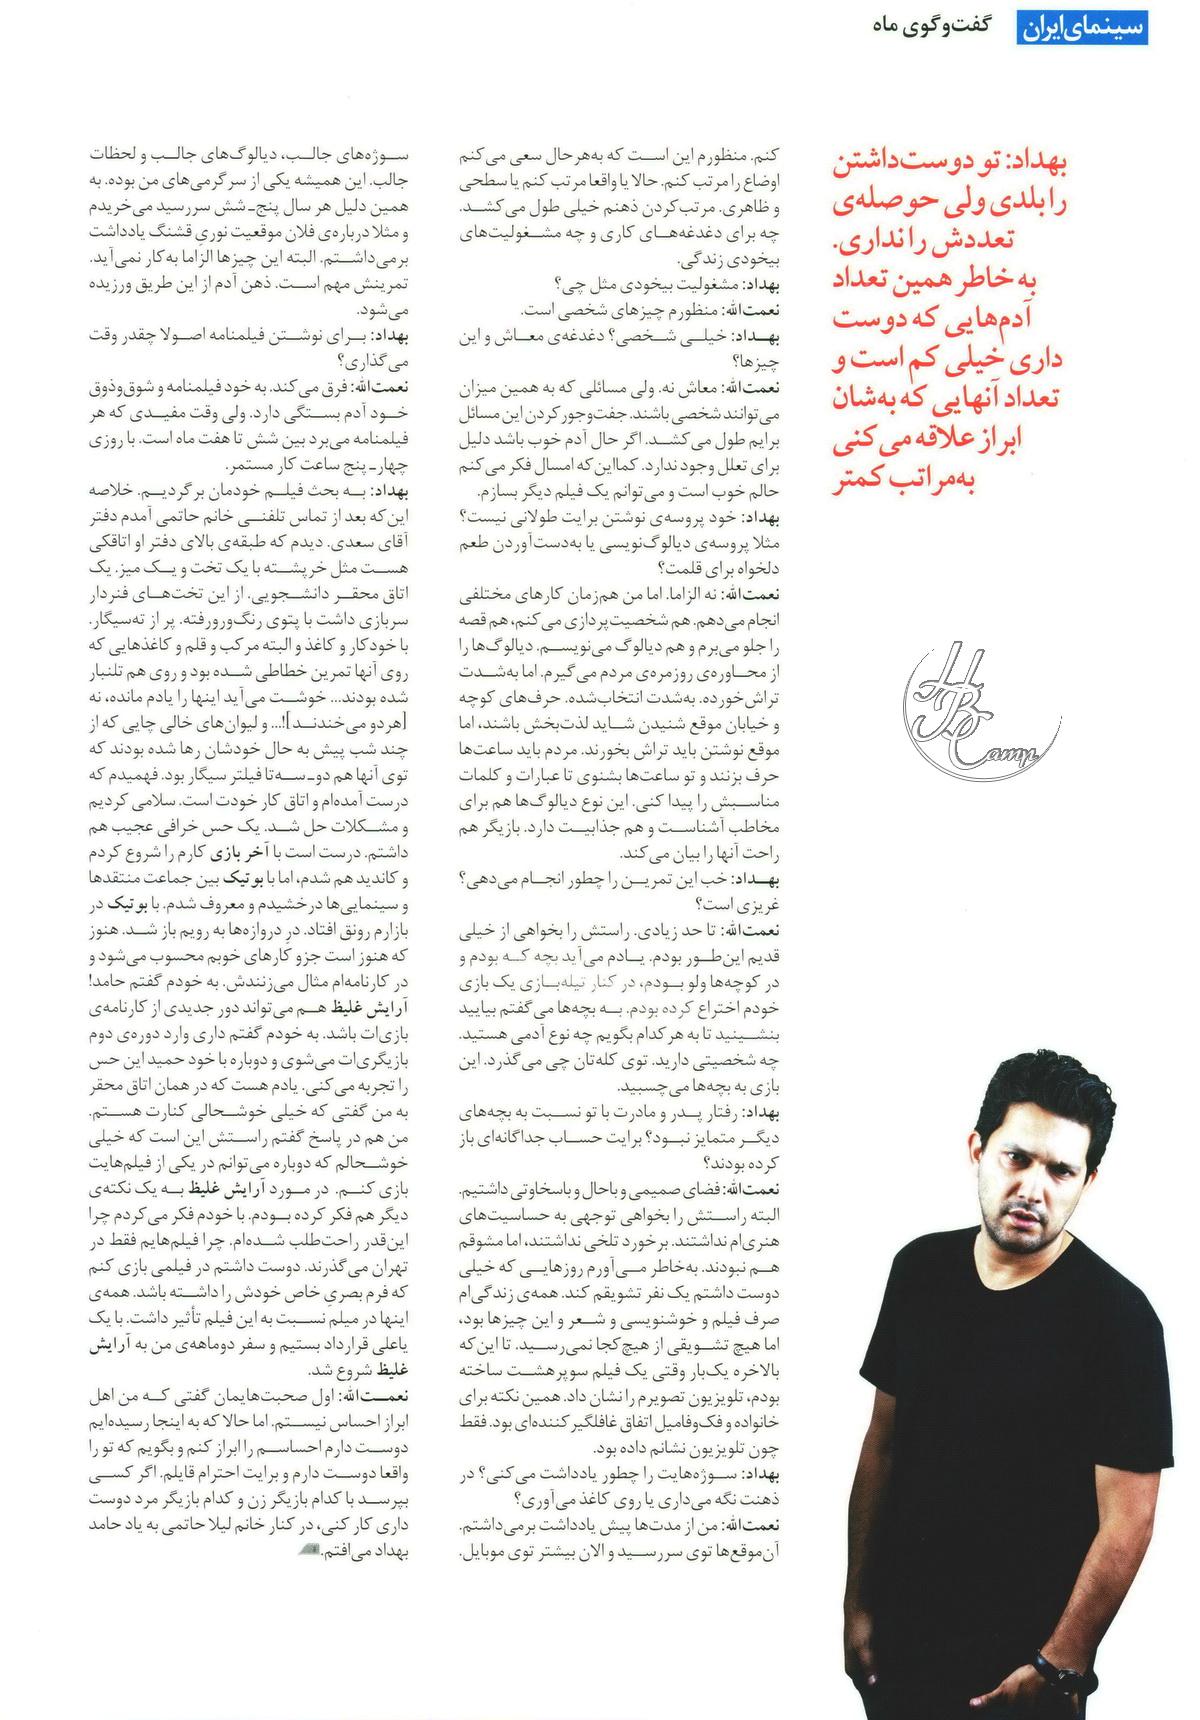 http://yotab.persiangig.com/magazin/24mag-56/07.jpg